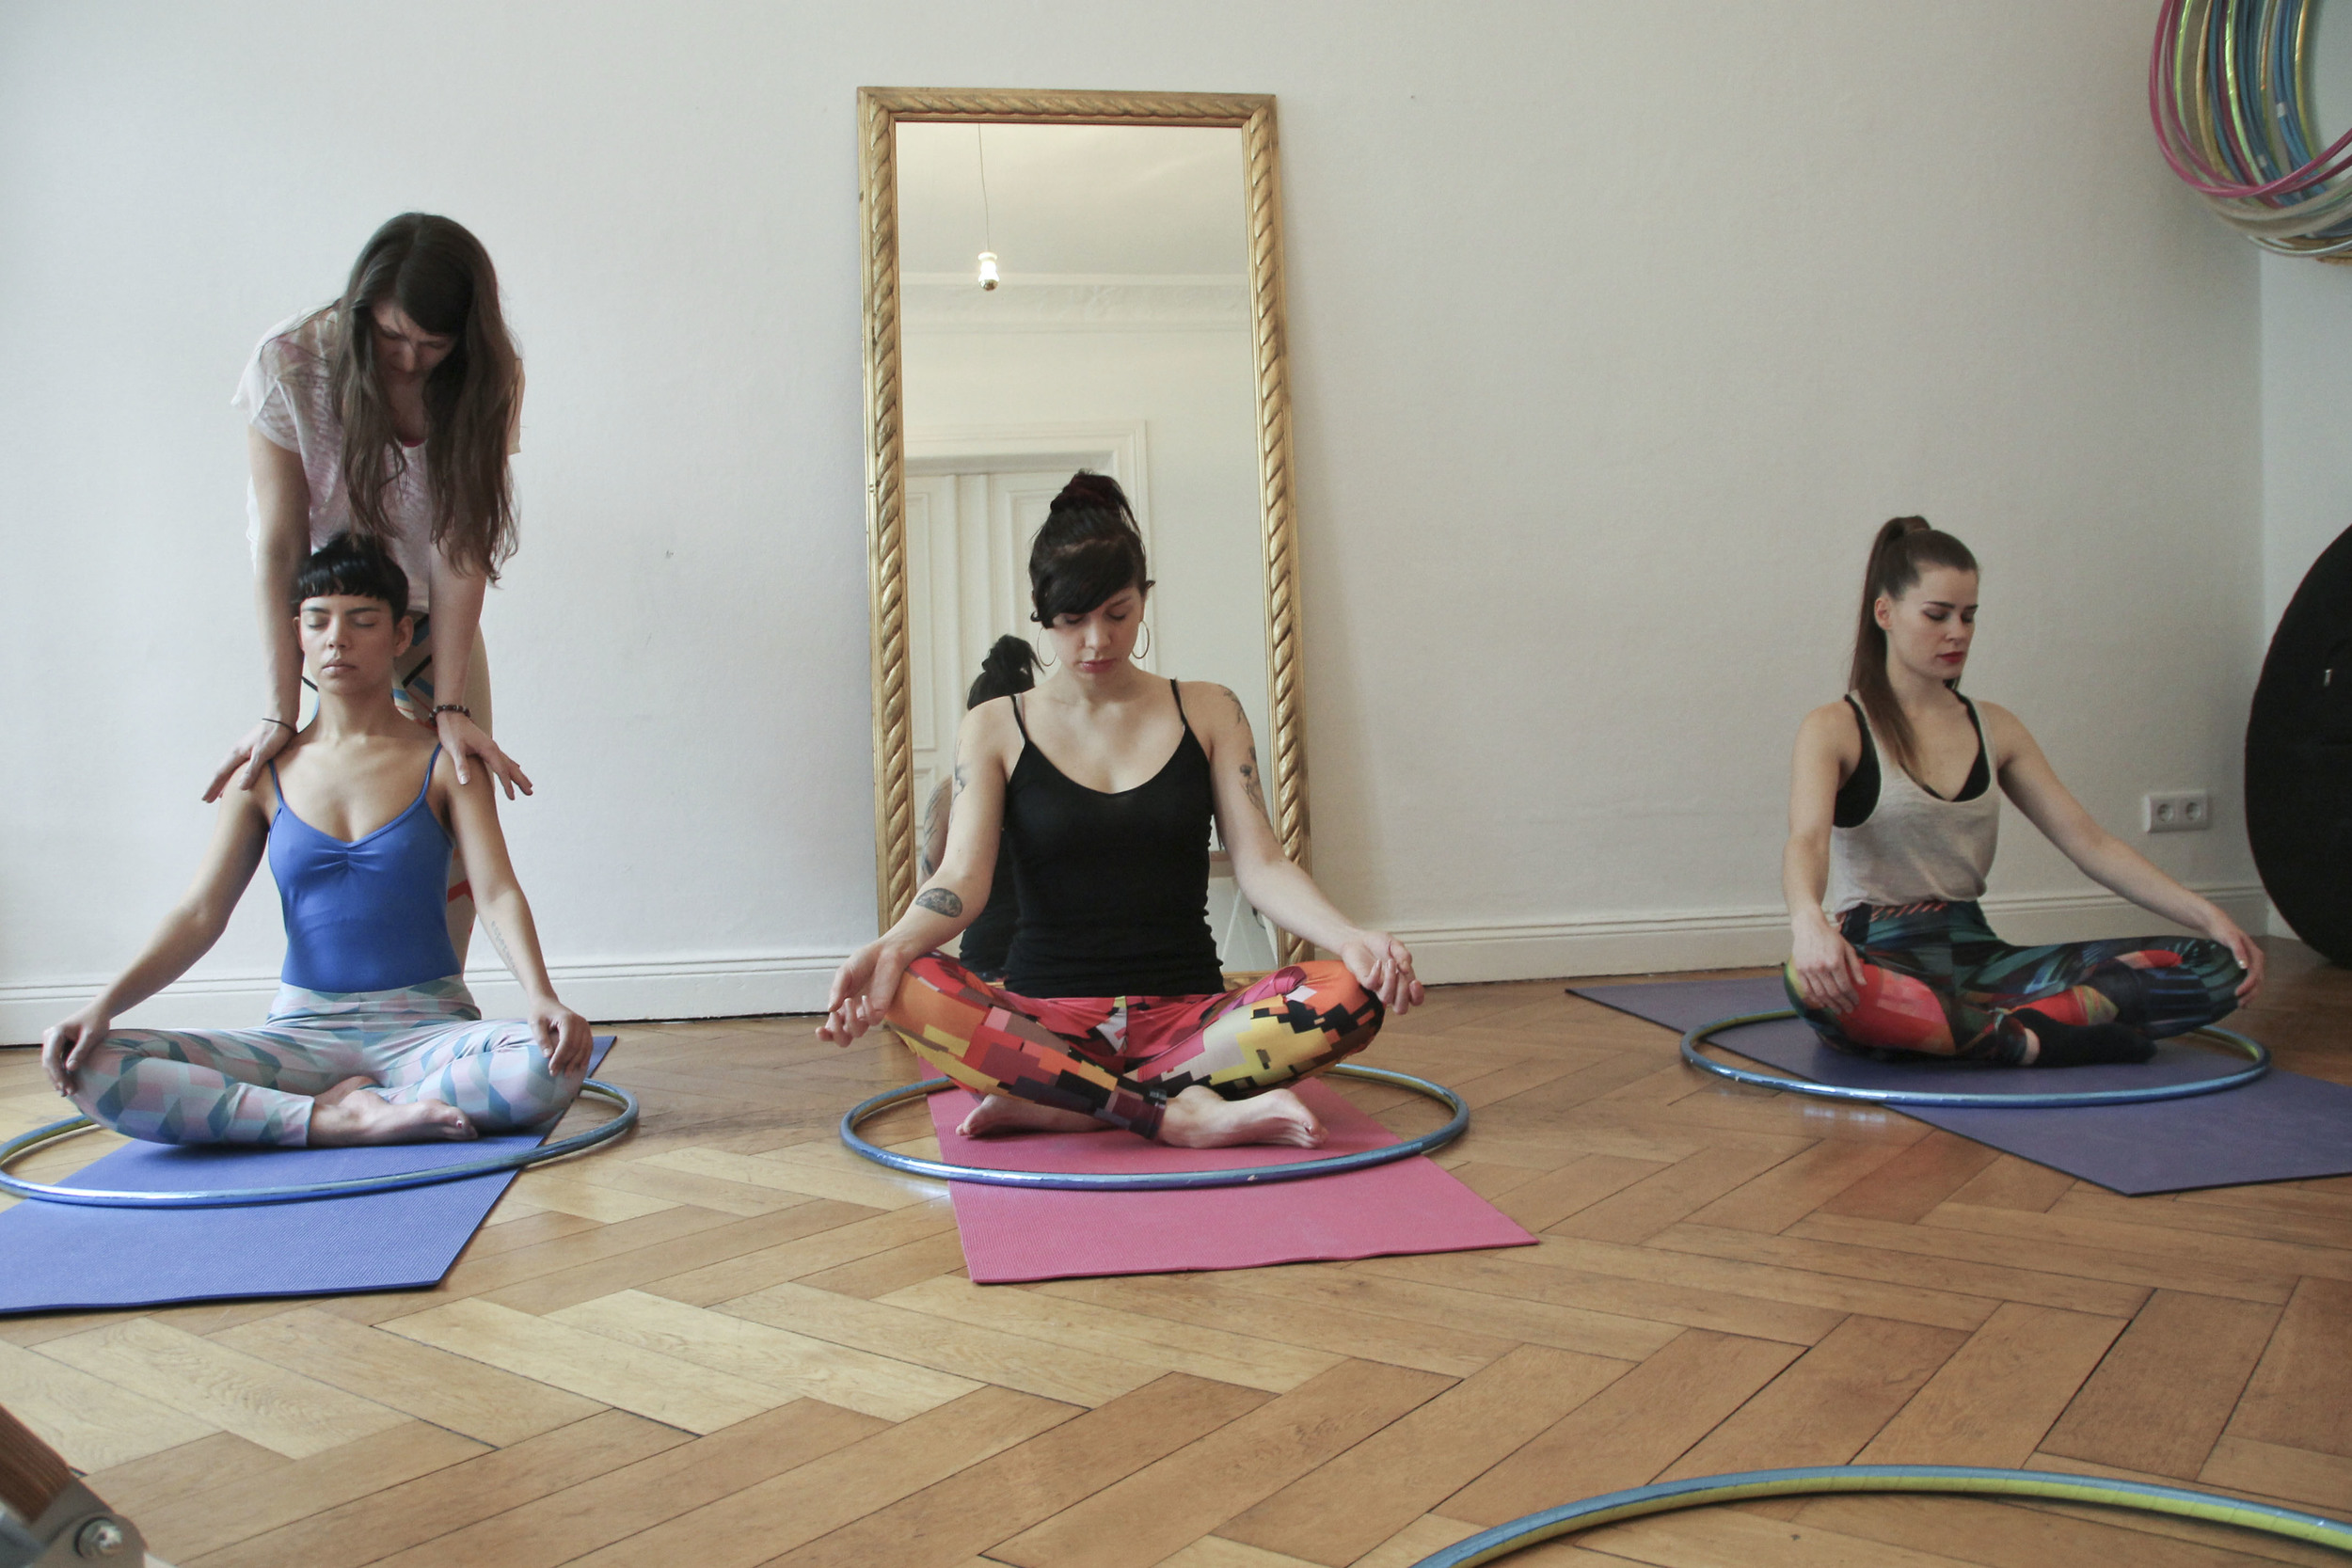 hoop yoga rebecca halls berlin1215.jpg